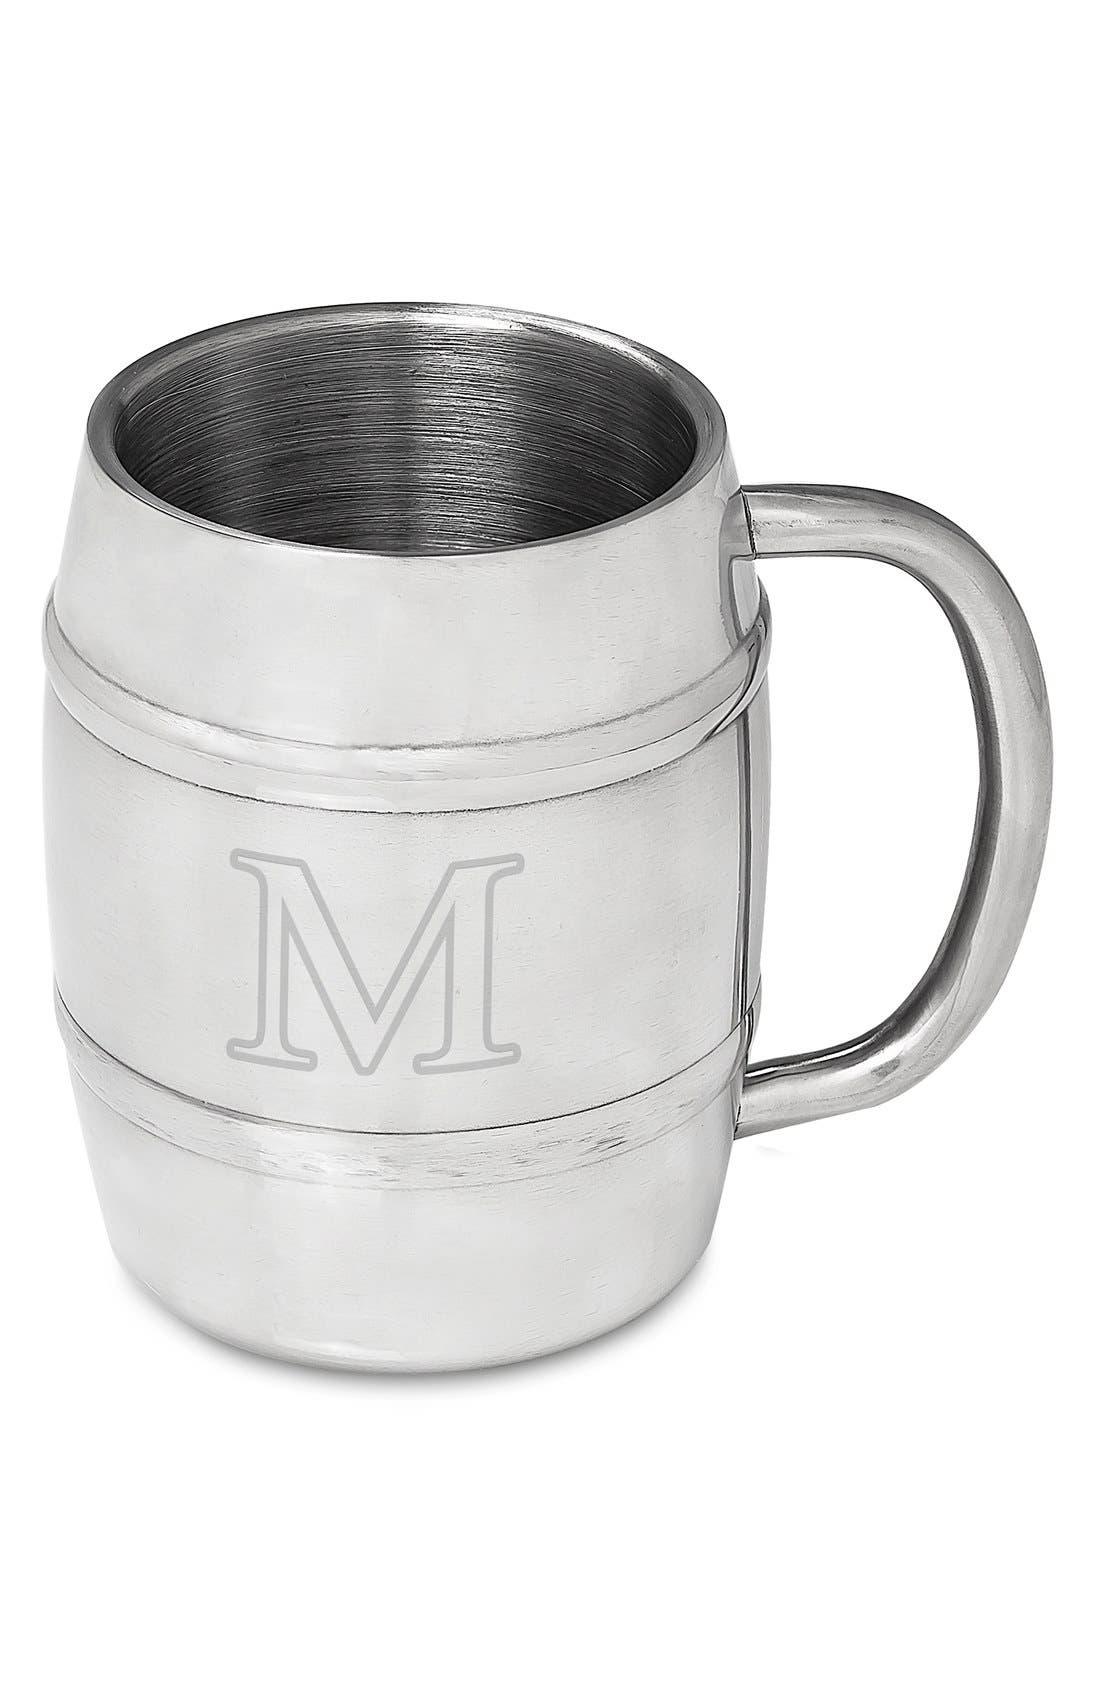 Monogram Stainless Steel Keg Mug,                             Main thumbnail 15, color,